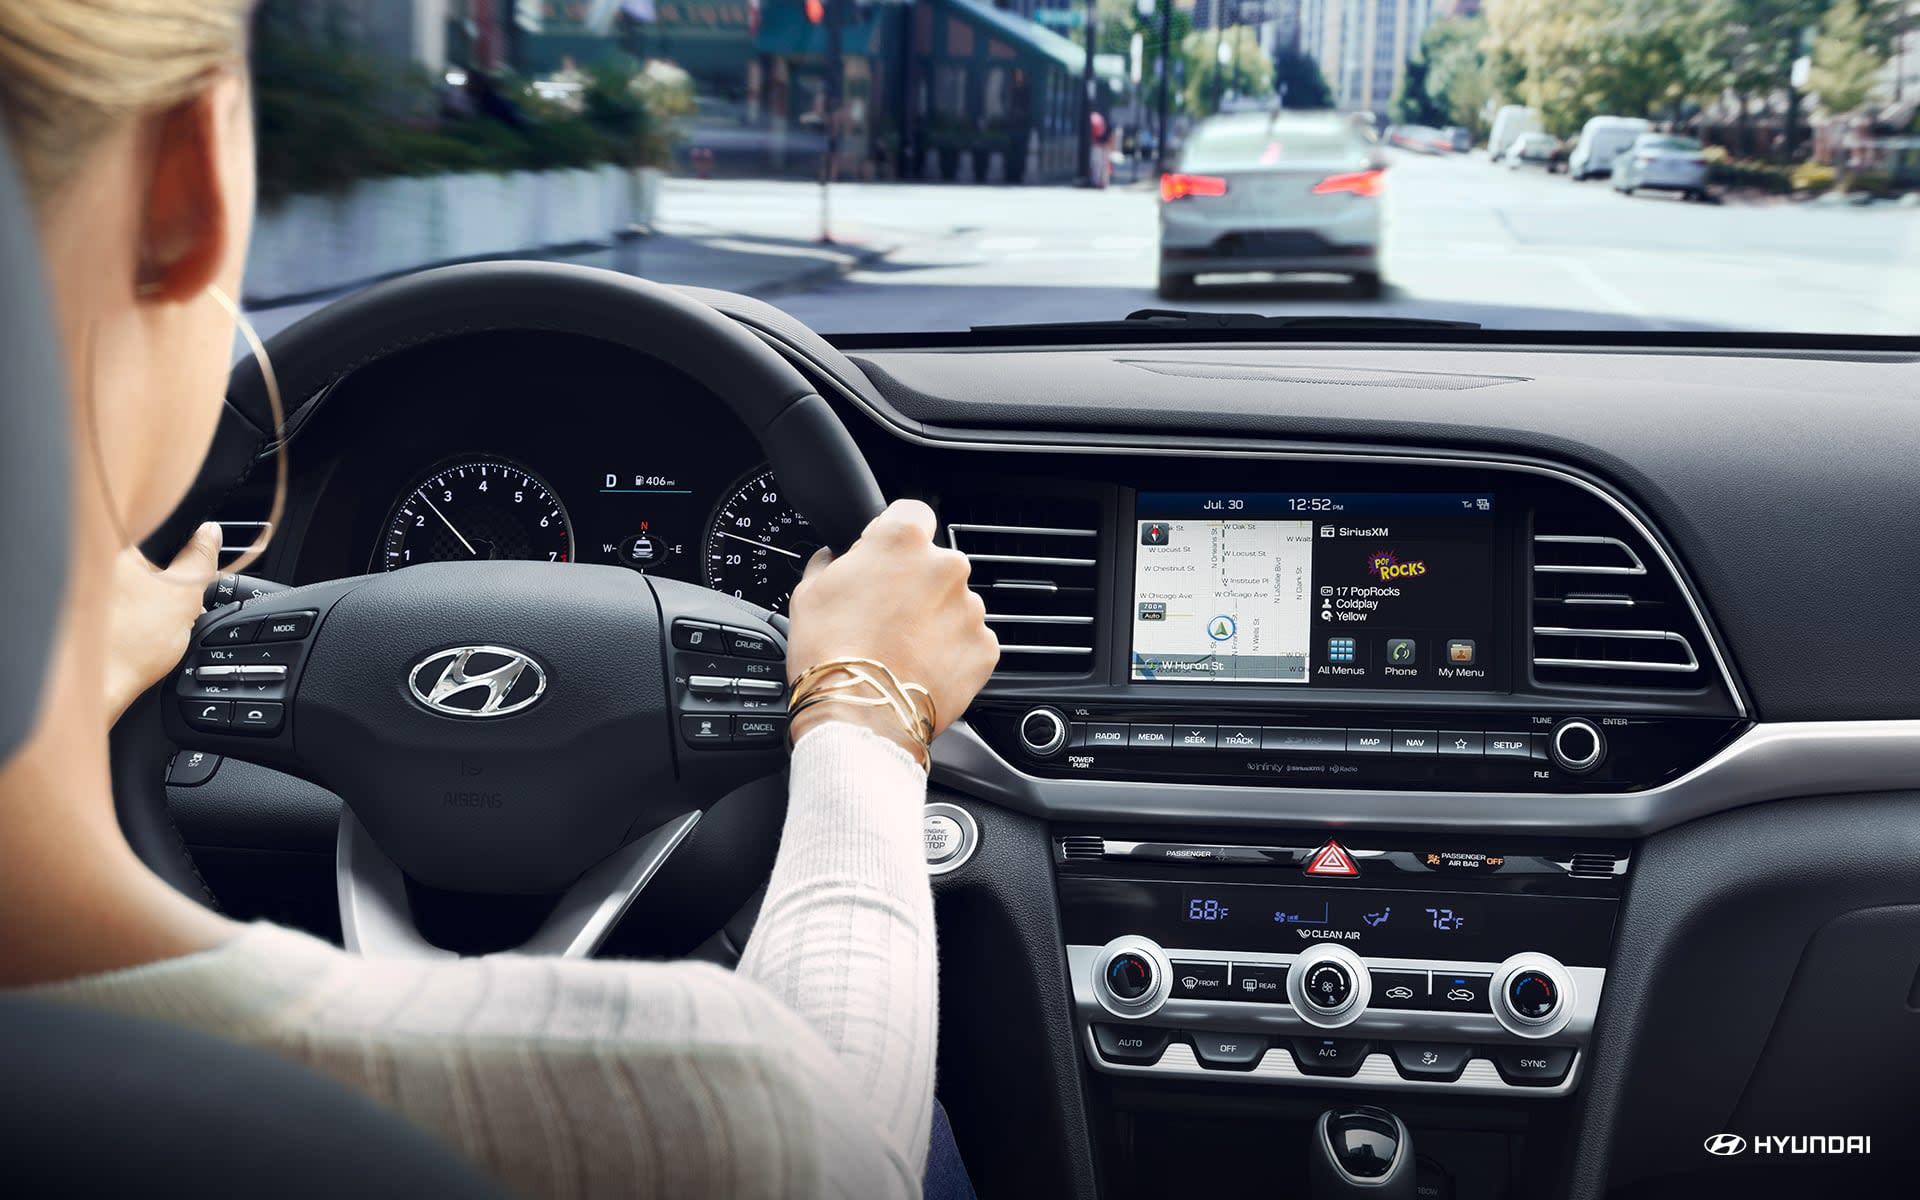 2020 Hyundai Elantra Cockpit